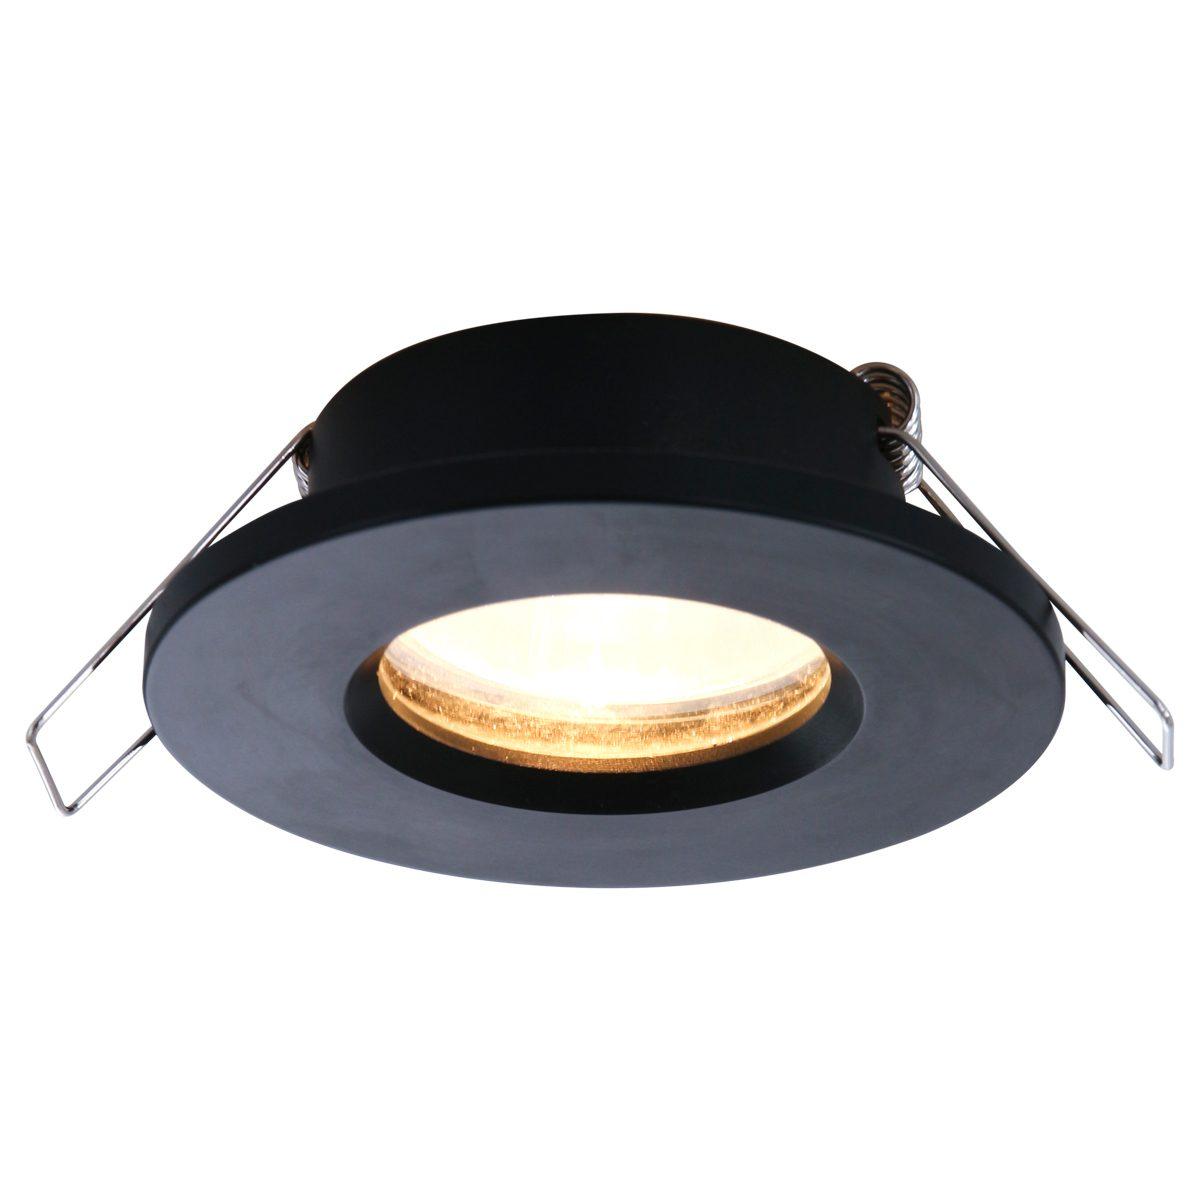 Badkamer Spot Ip44 Zwart Lampenconcurrent Nl